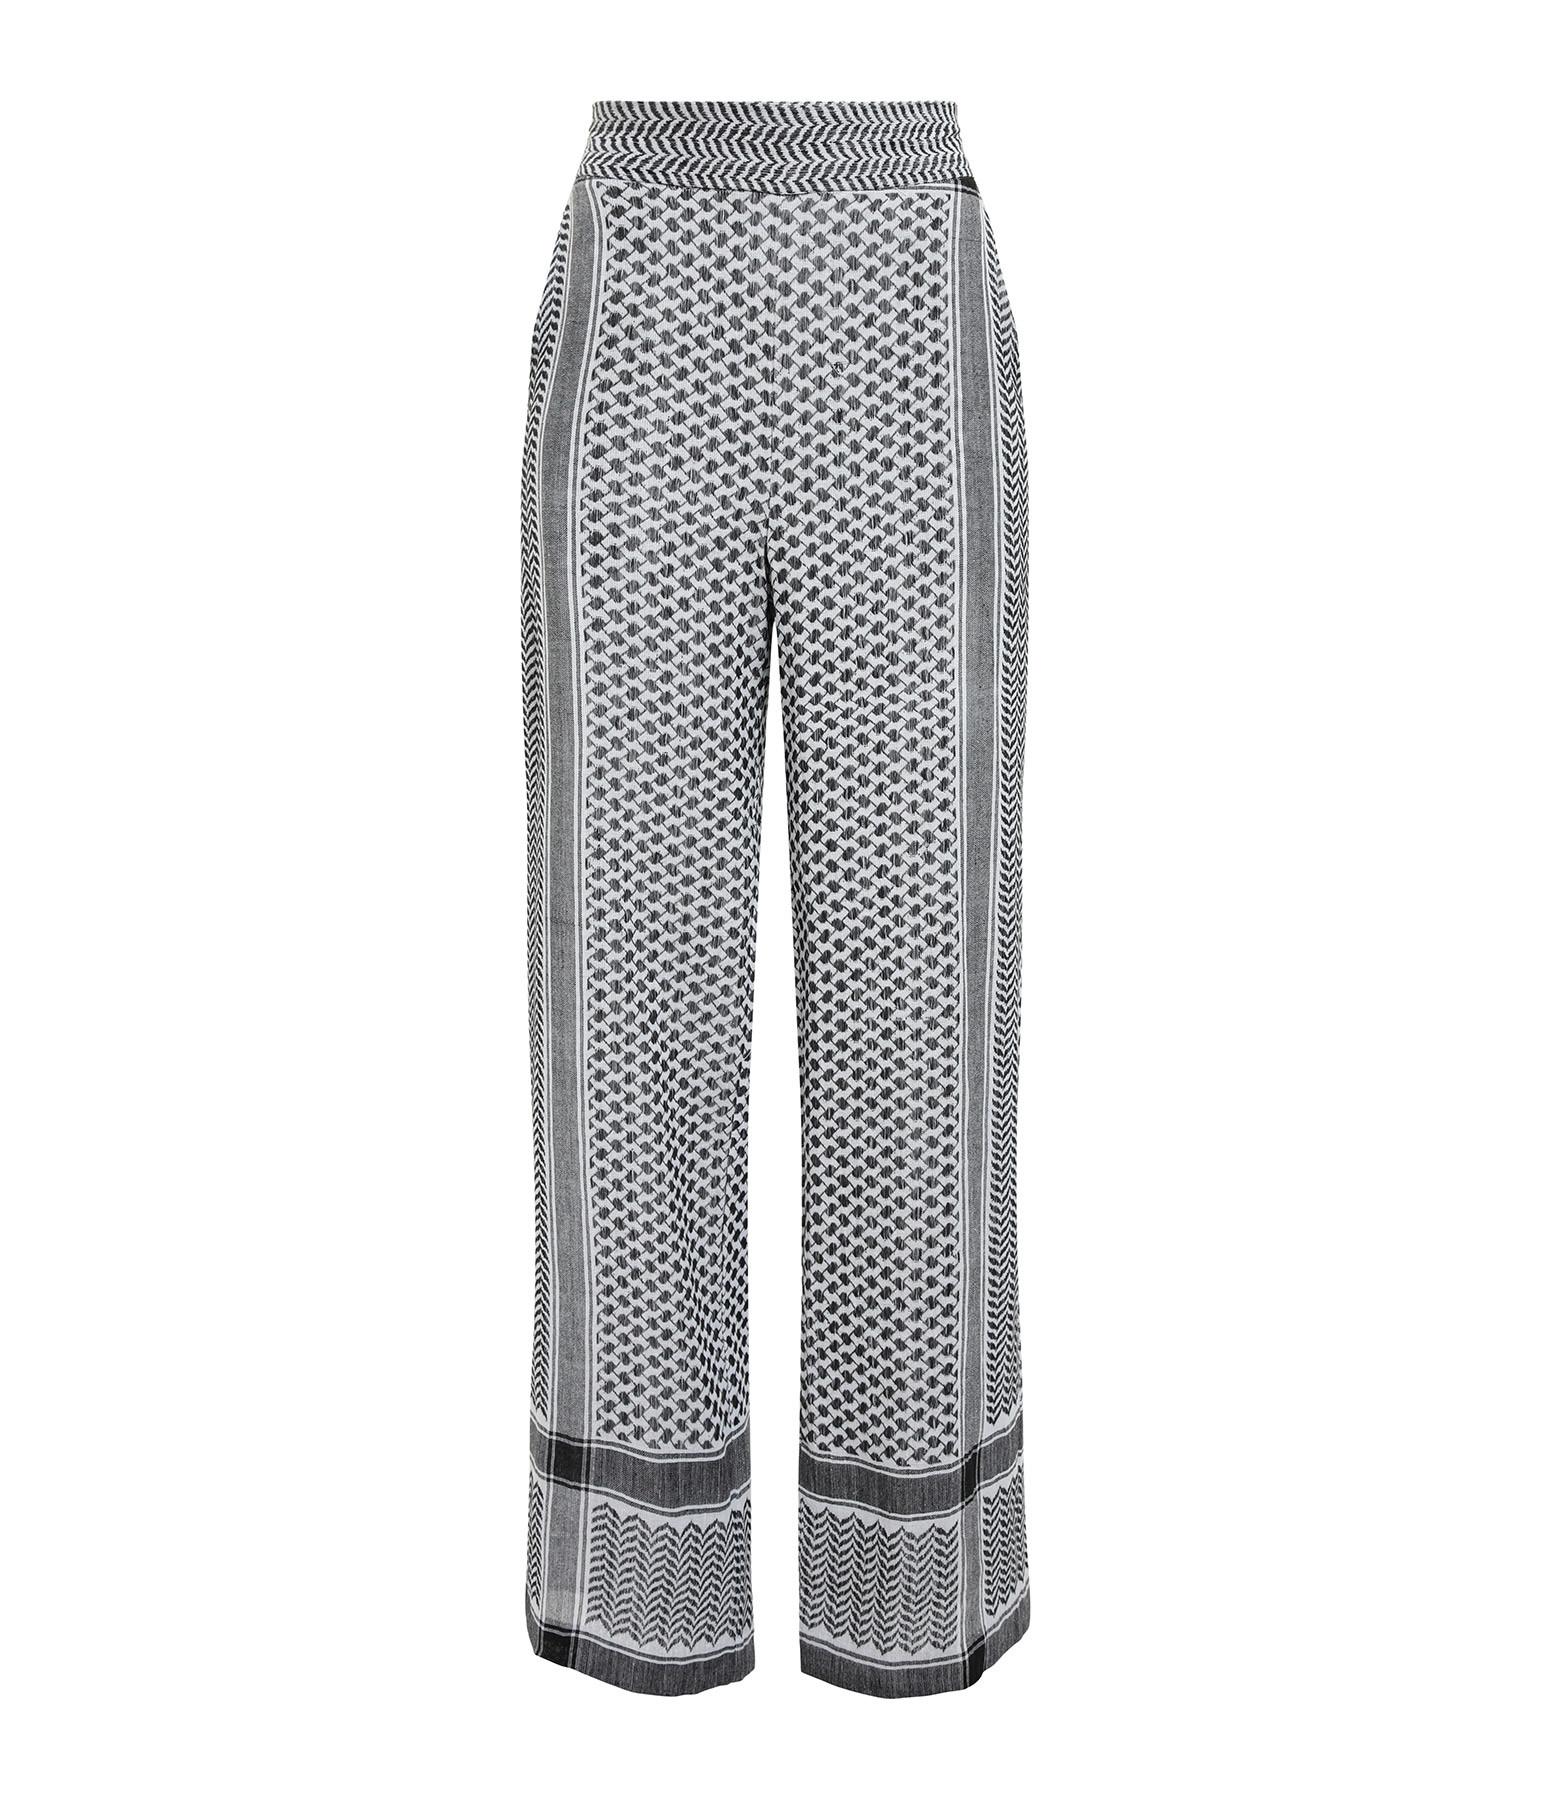 ROUGH STUDIOS - Pantalon Veneto Coton Brodé Noir Blanc